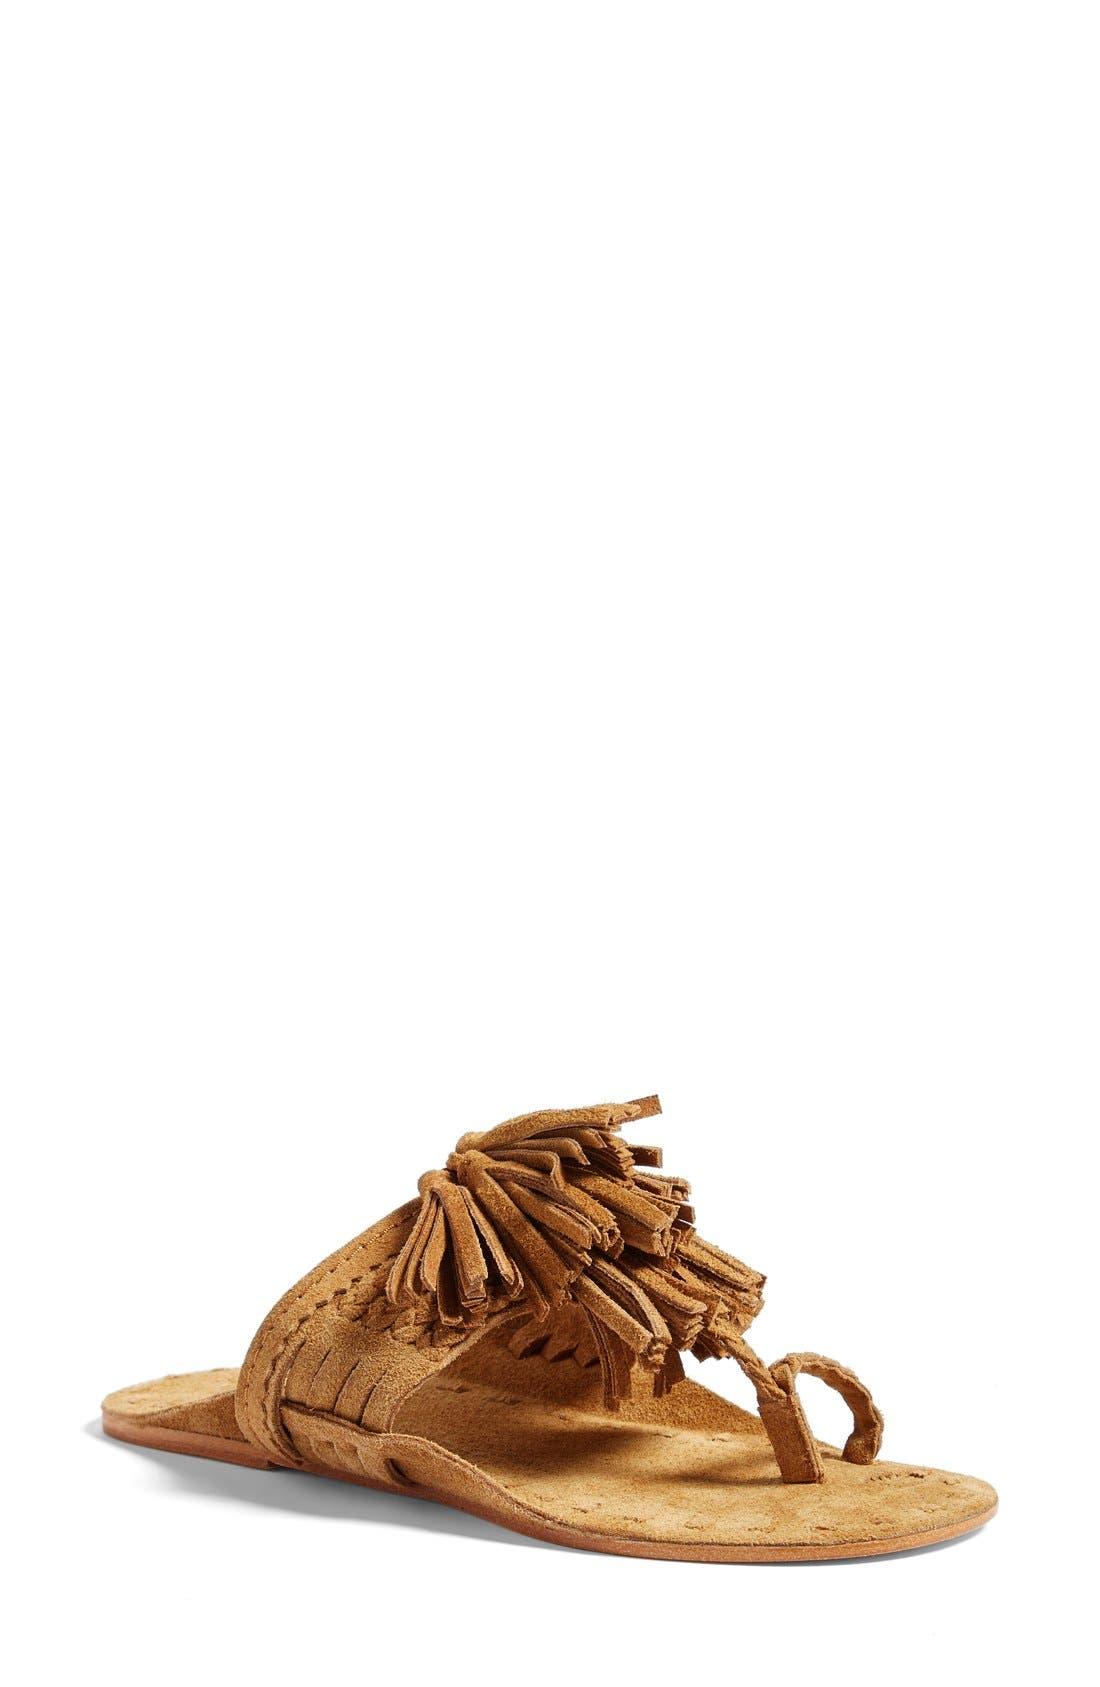 Scaramouch Tassel Sandal,                             Main thumbnail 1, color,                             200